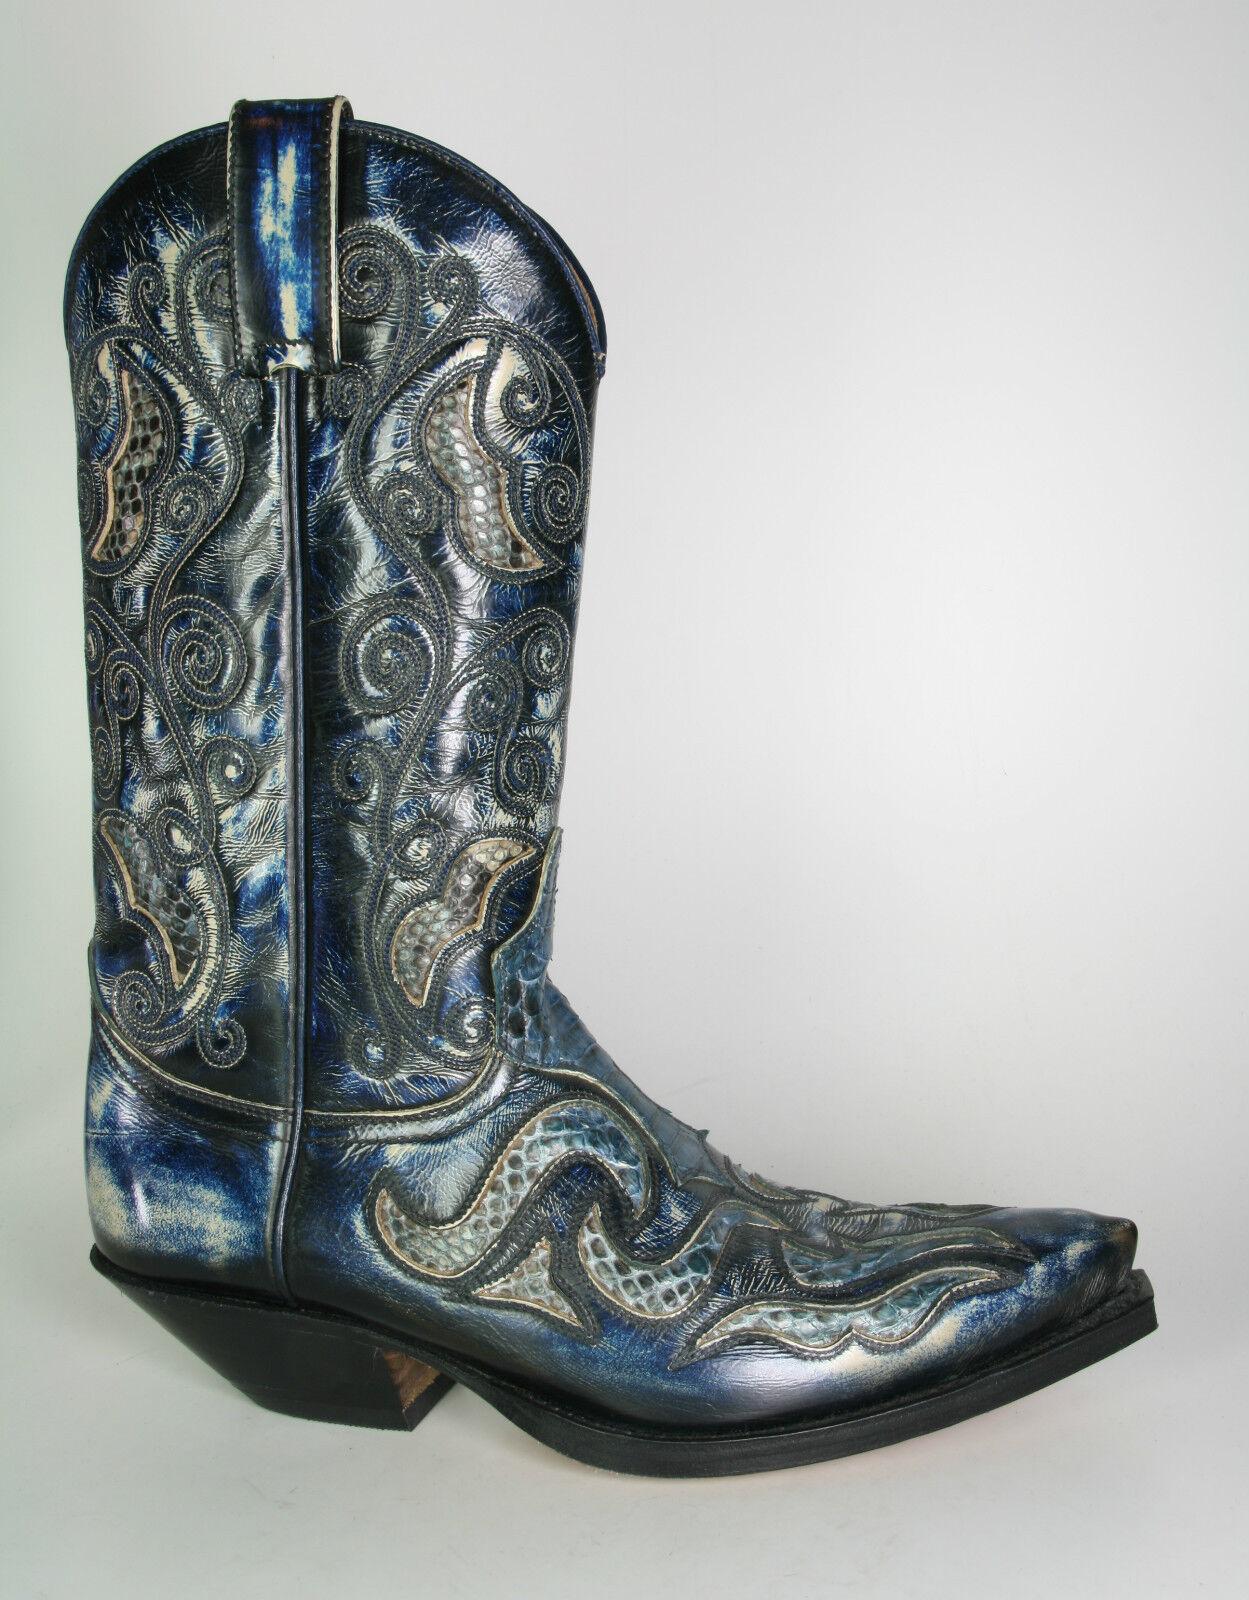 7428 Sendra Cowboystiefel Denver Azul Dirty Westernstiefel Blau mit Pythonleder